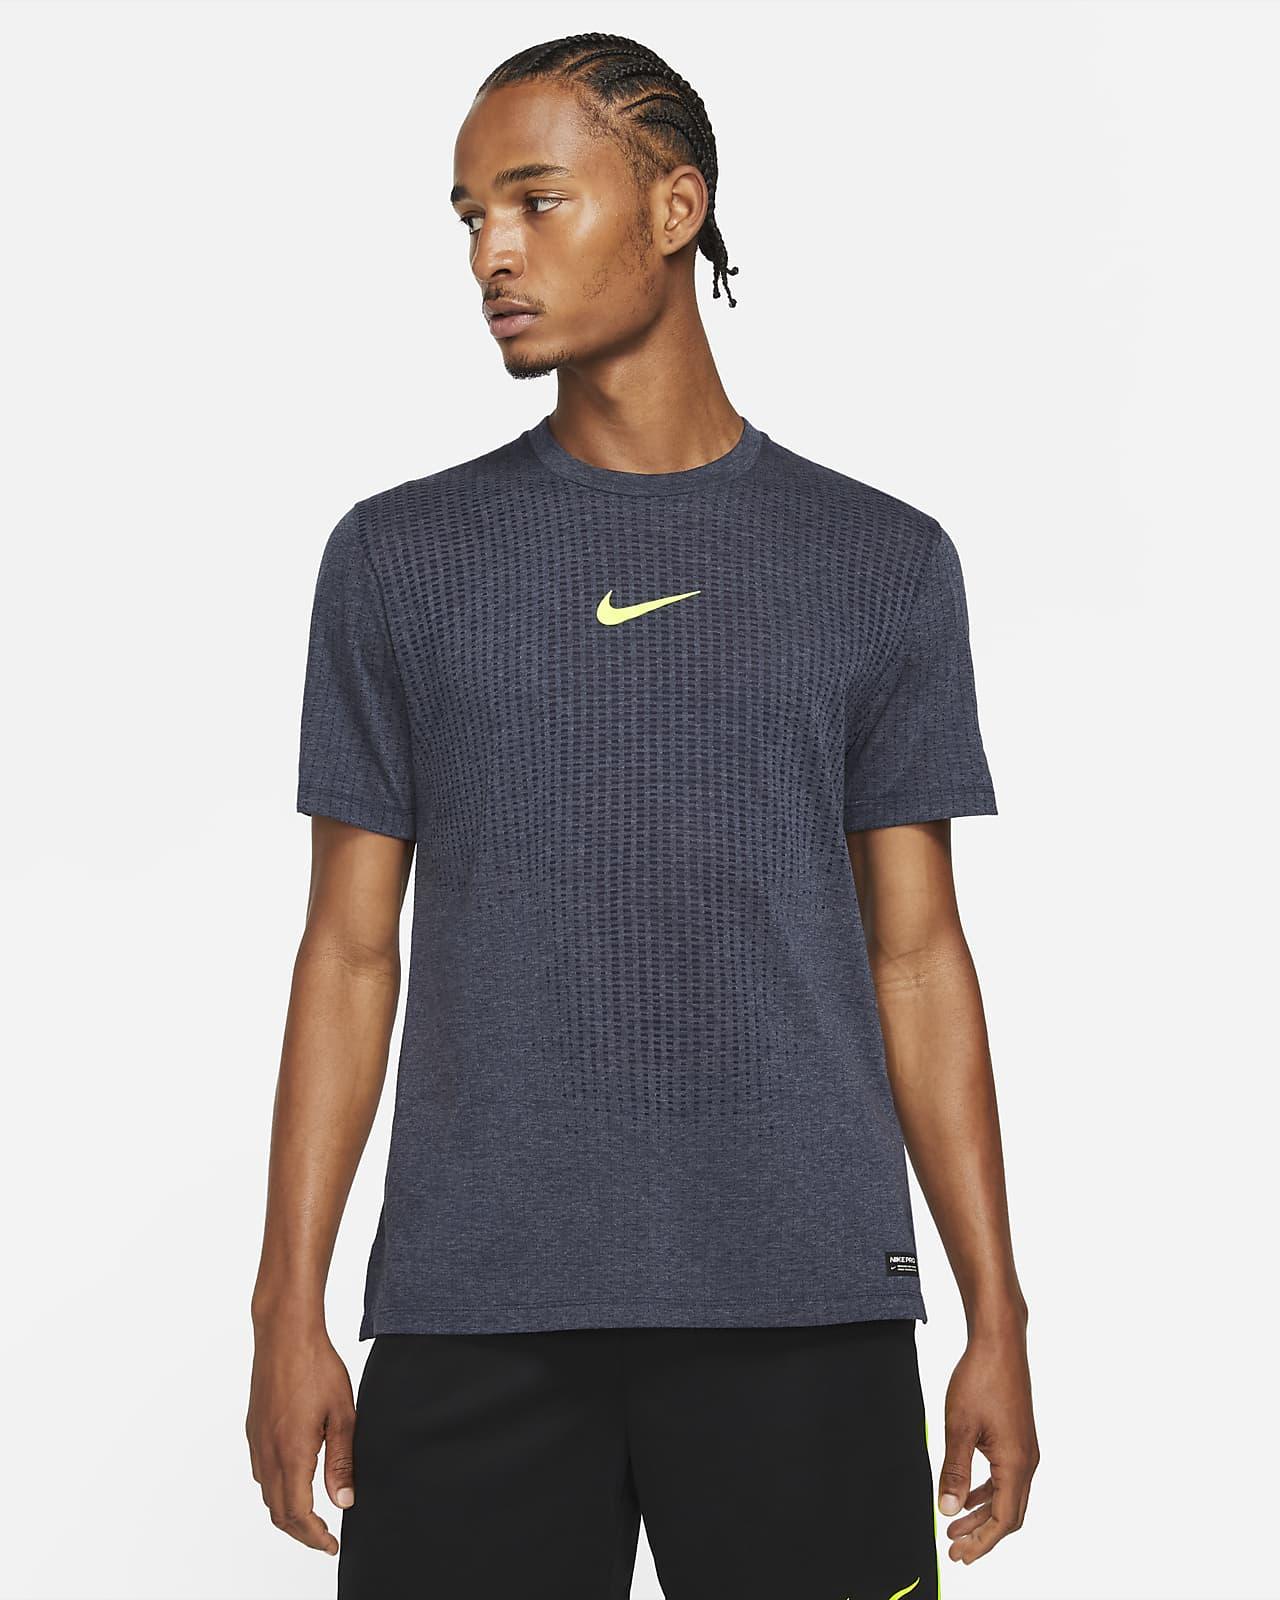 Nike Pro Dri-FIT ADV Kurzarmshirt für Herren